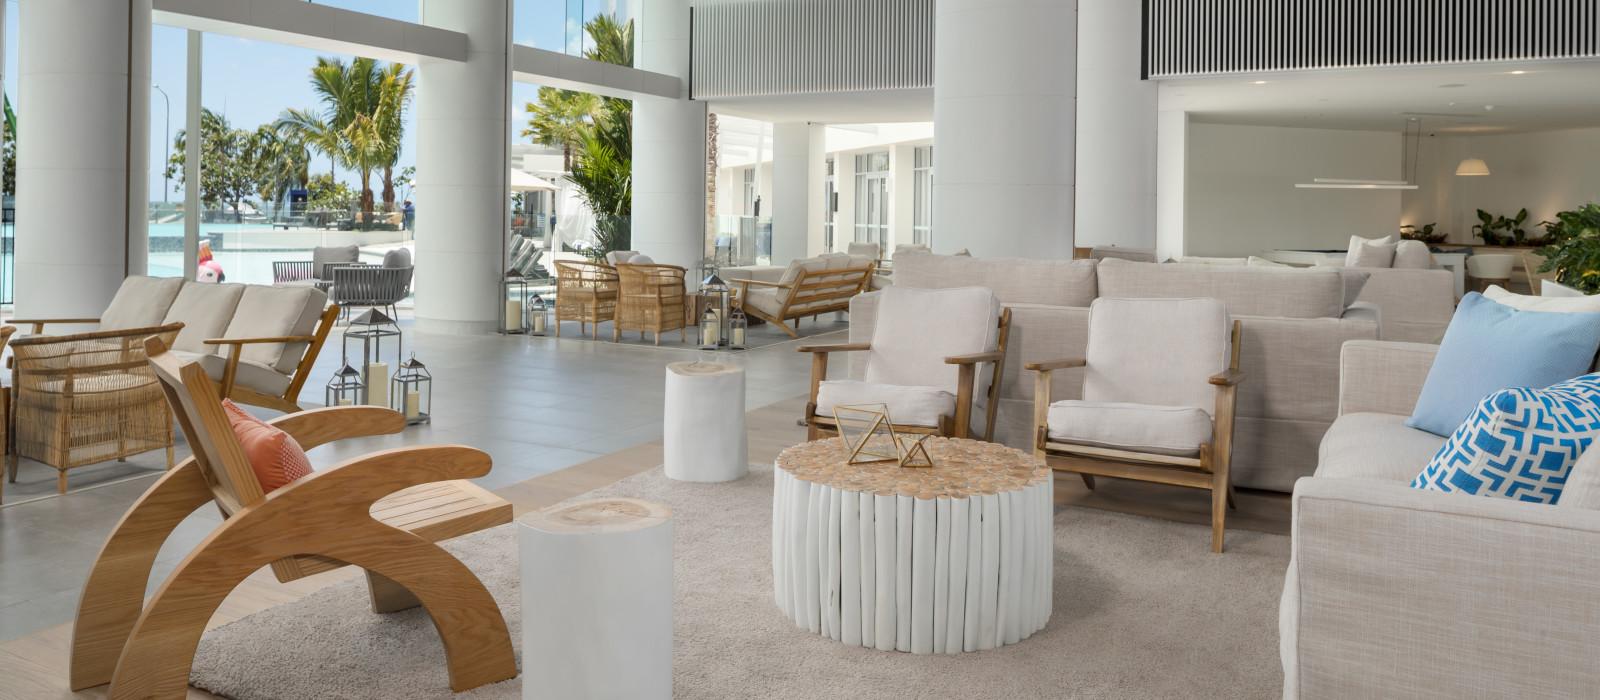 Hotel Riley, a Crystalbrook Collection Resort Australien